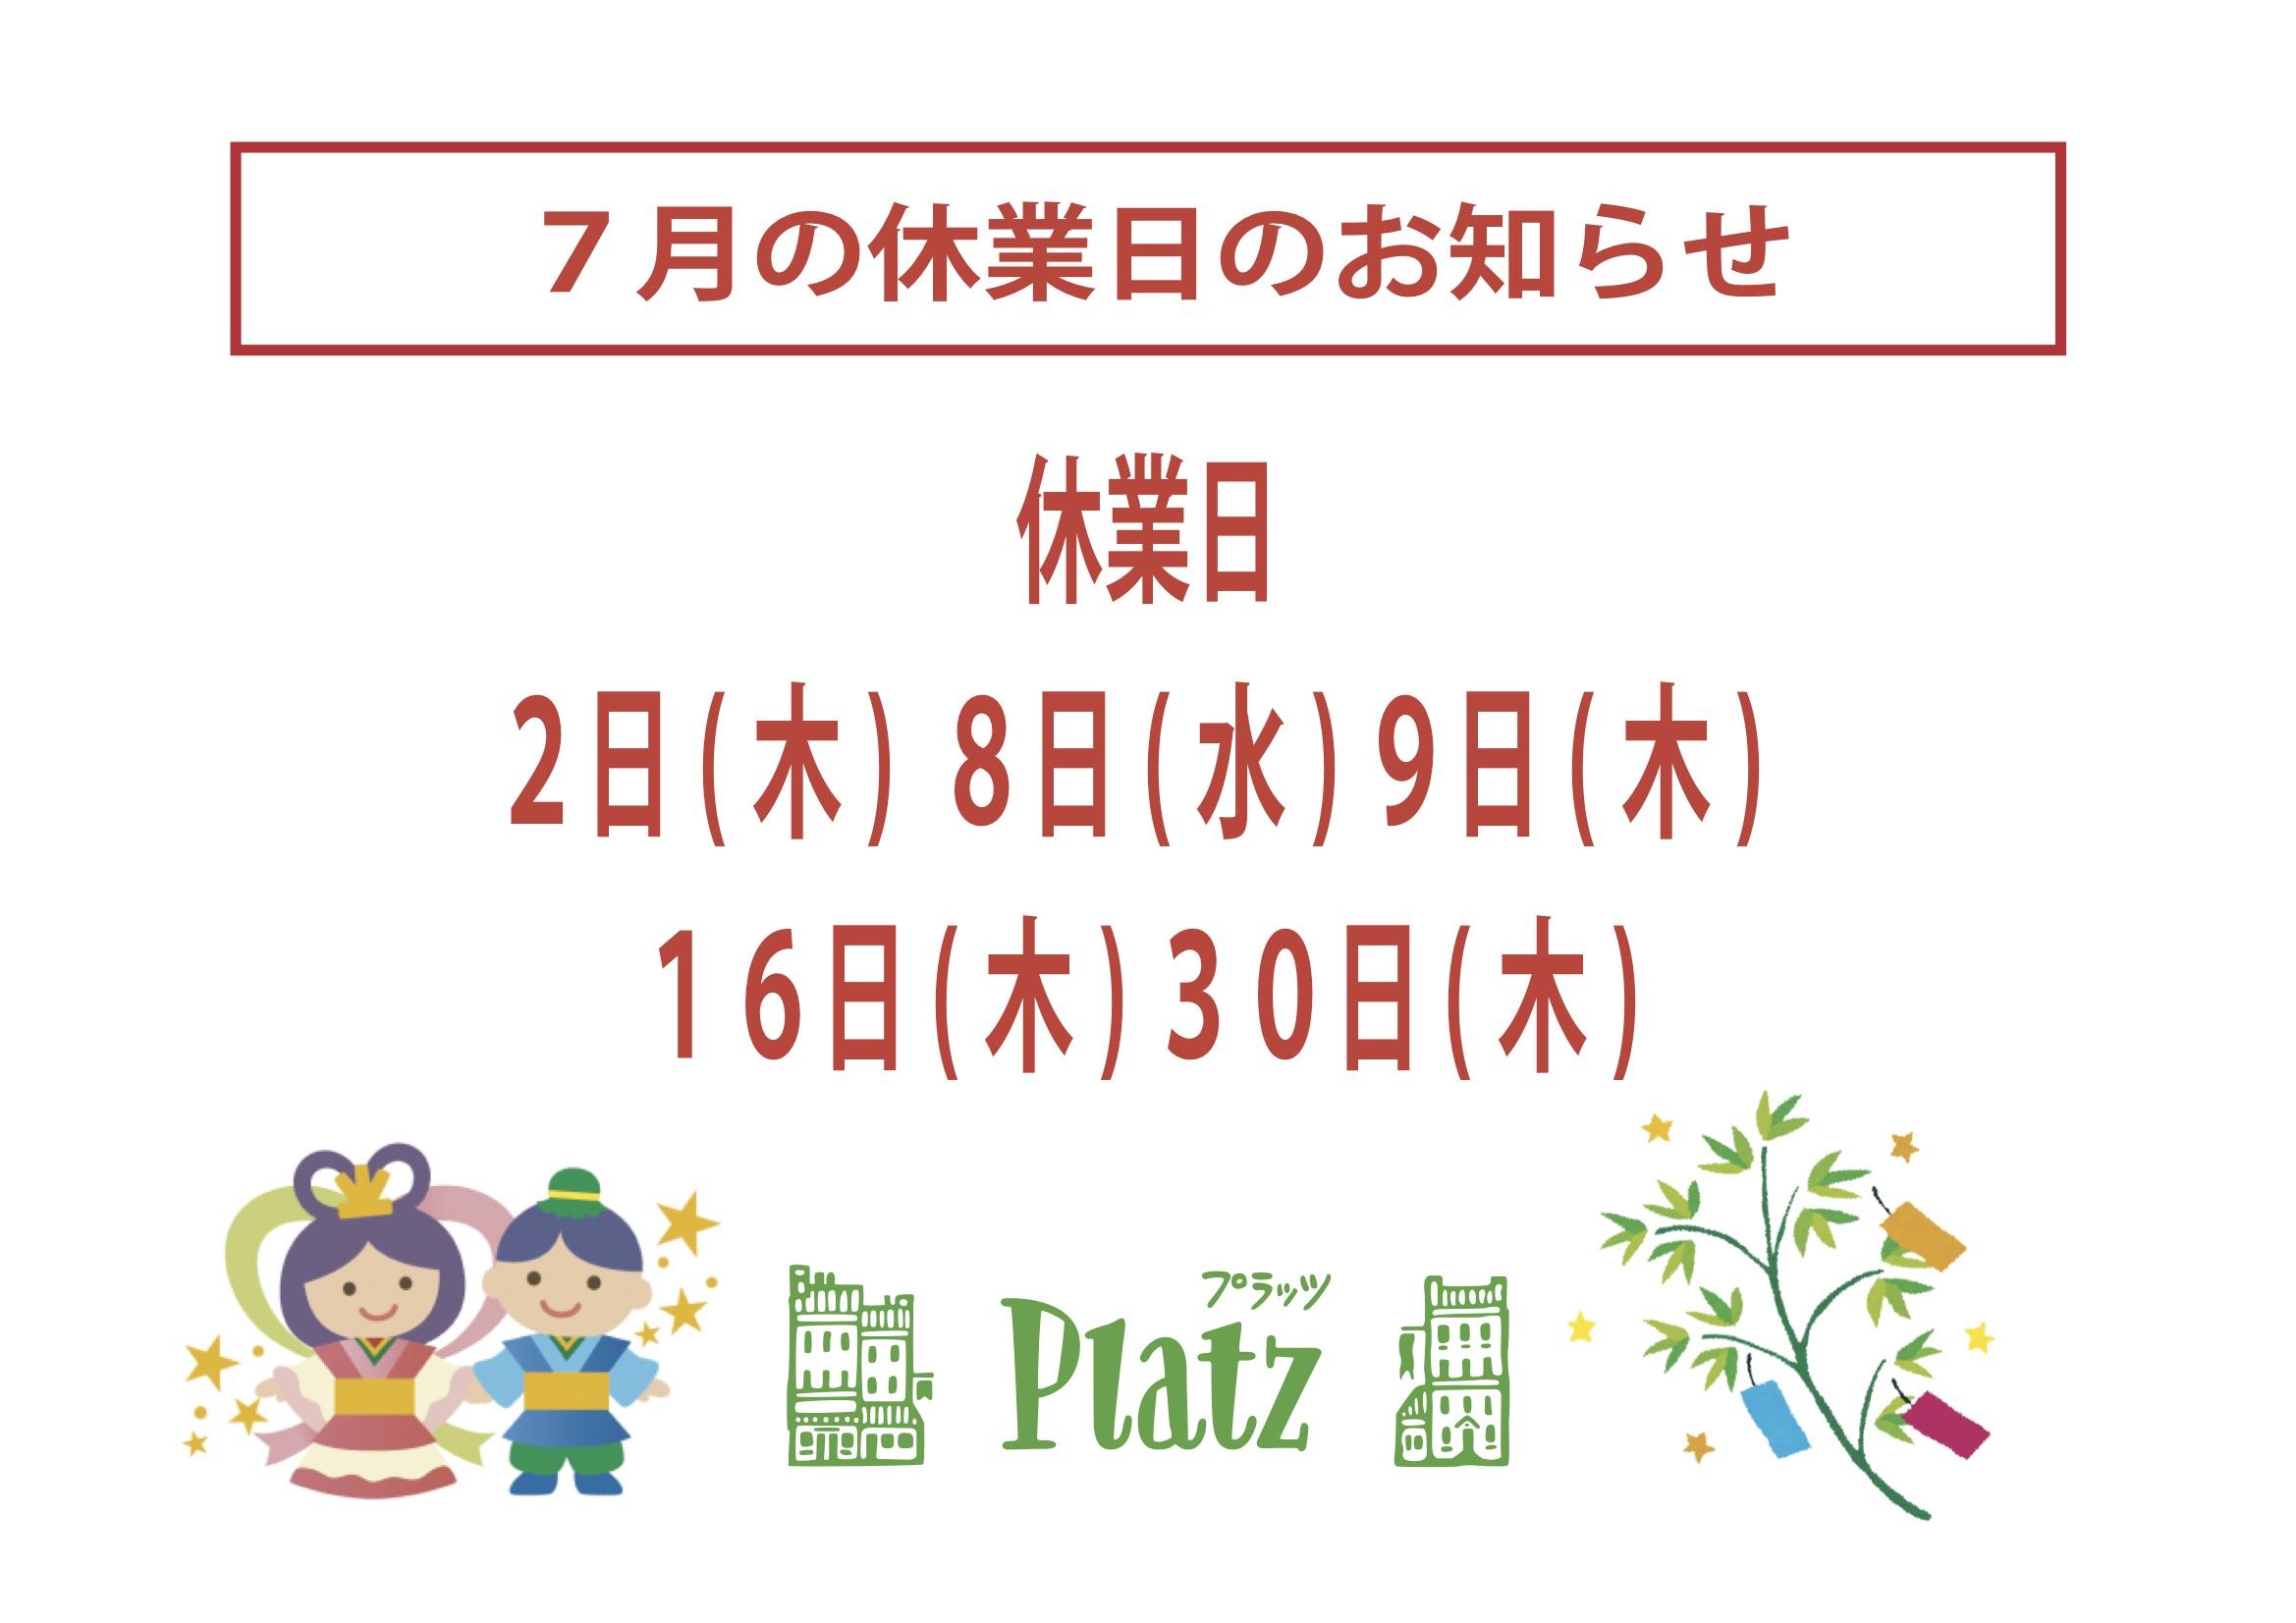 http://www.kyoto-platz.jp/news/images/2020.%EF%BC%97%E6%9C%88.jpg